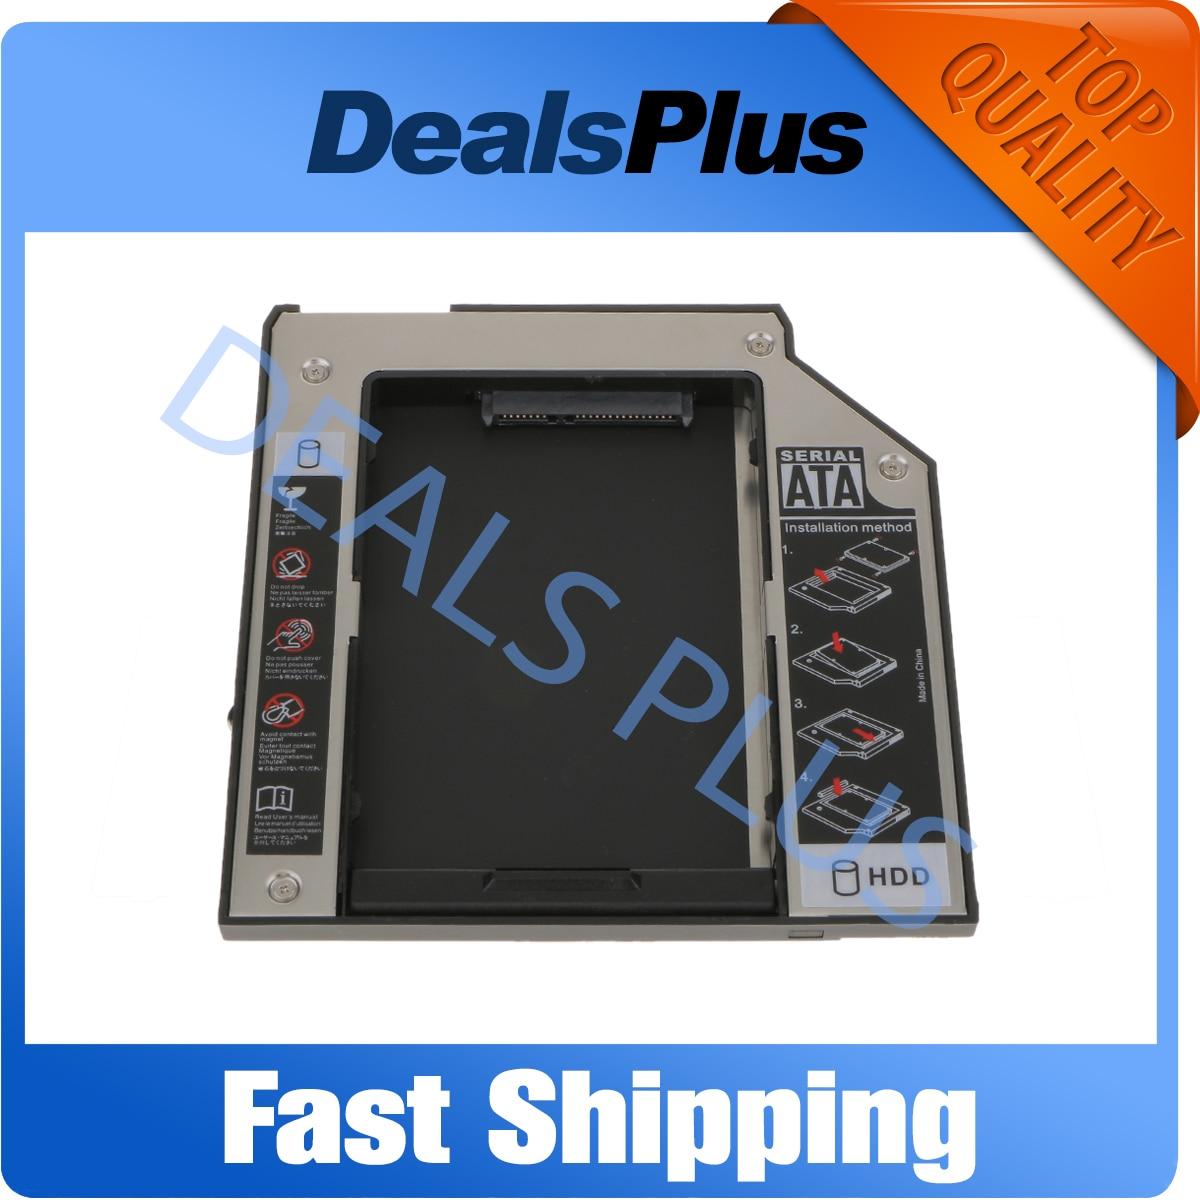 Ultrabay Slim SATA 2nd Hdd Hard Drive Caddy For Module Lenovo ThinkPad T400 T500 New 9.5mm